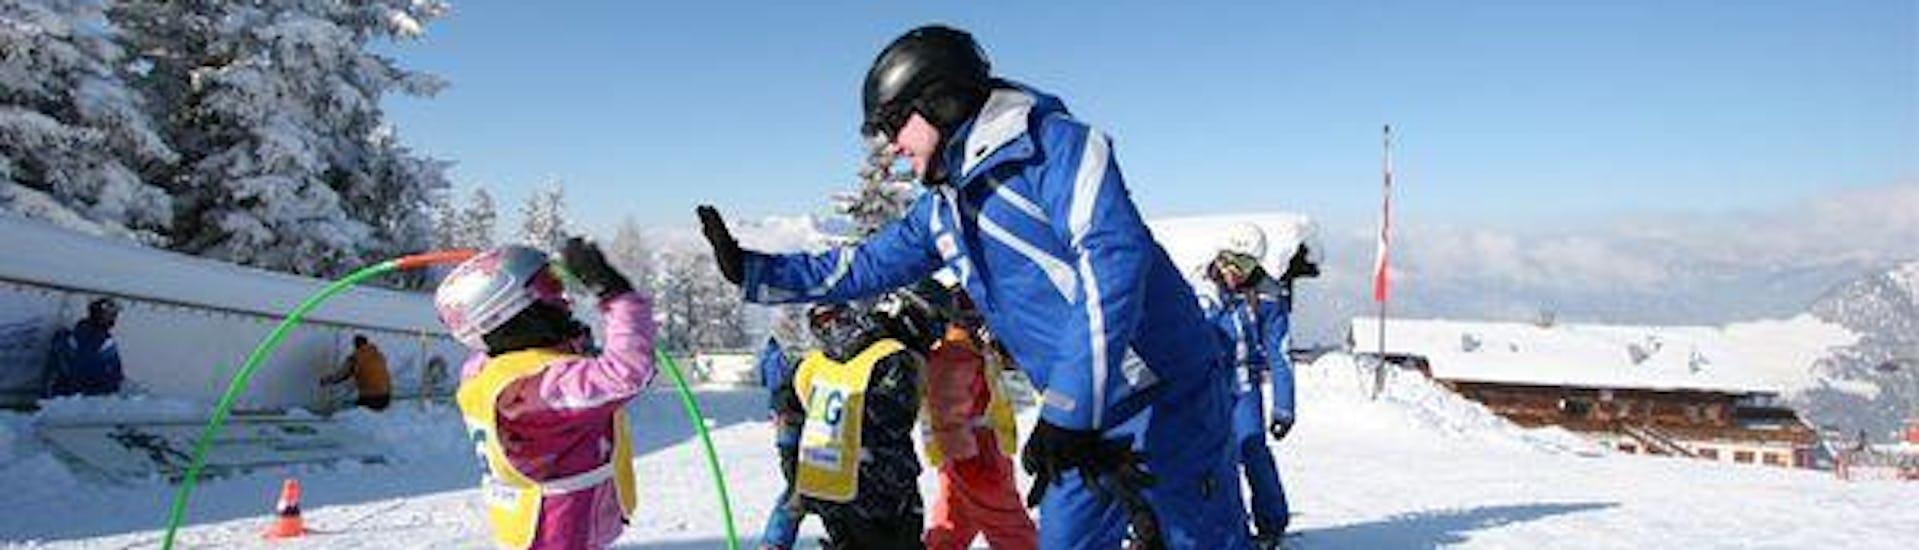 Kids Ski Lessons (5-12 years) - Beginners